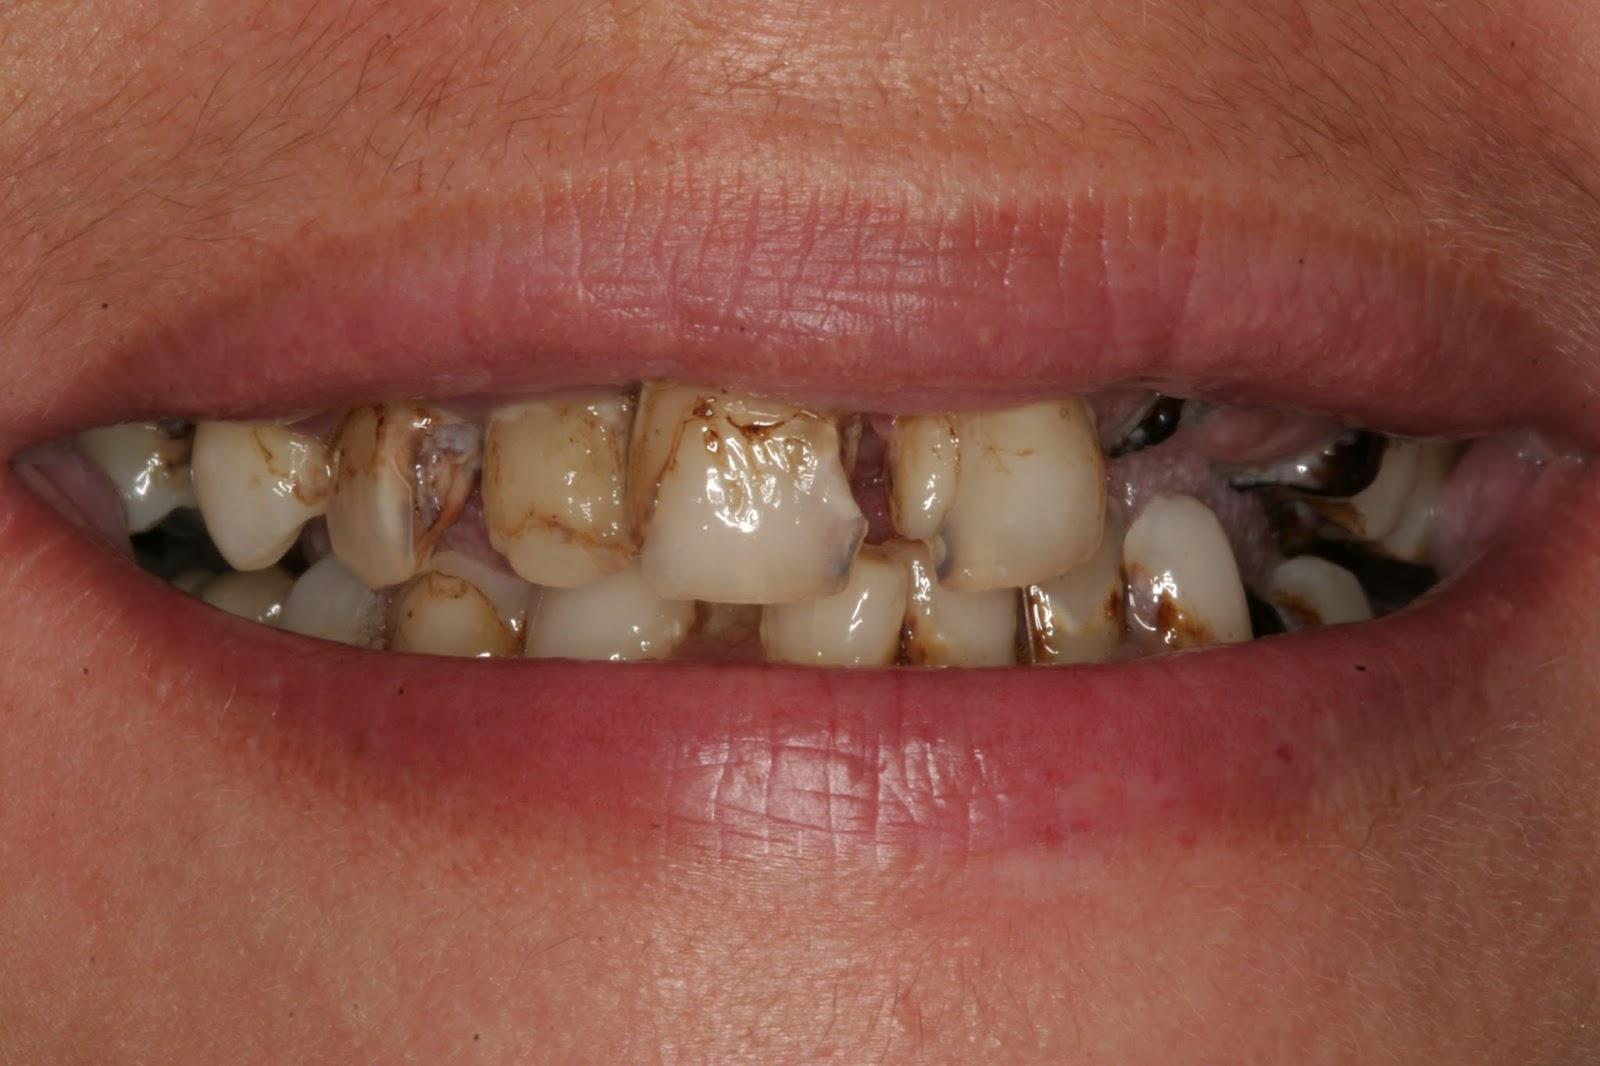 Do Sugary Drinks Effect Teeth Enamel